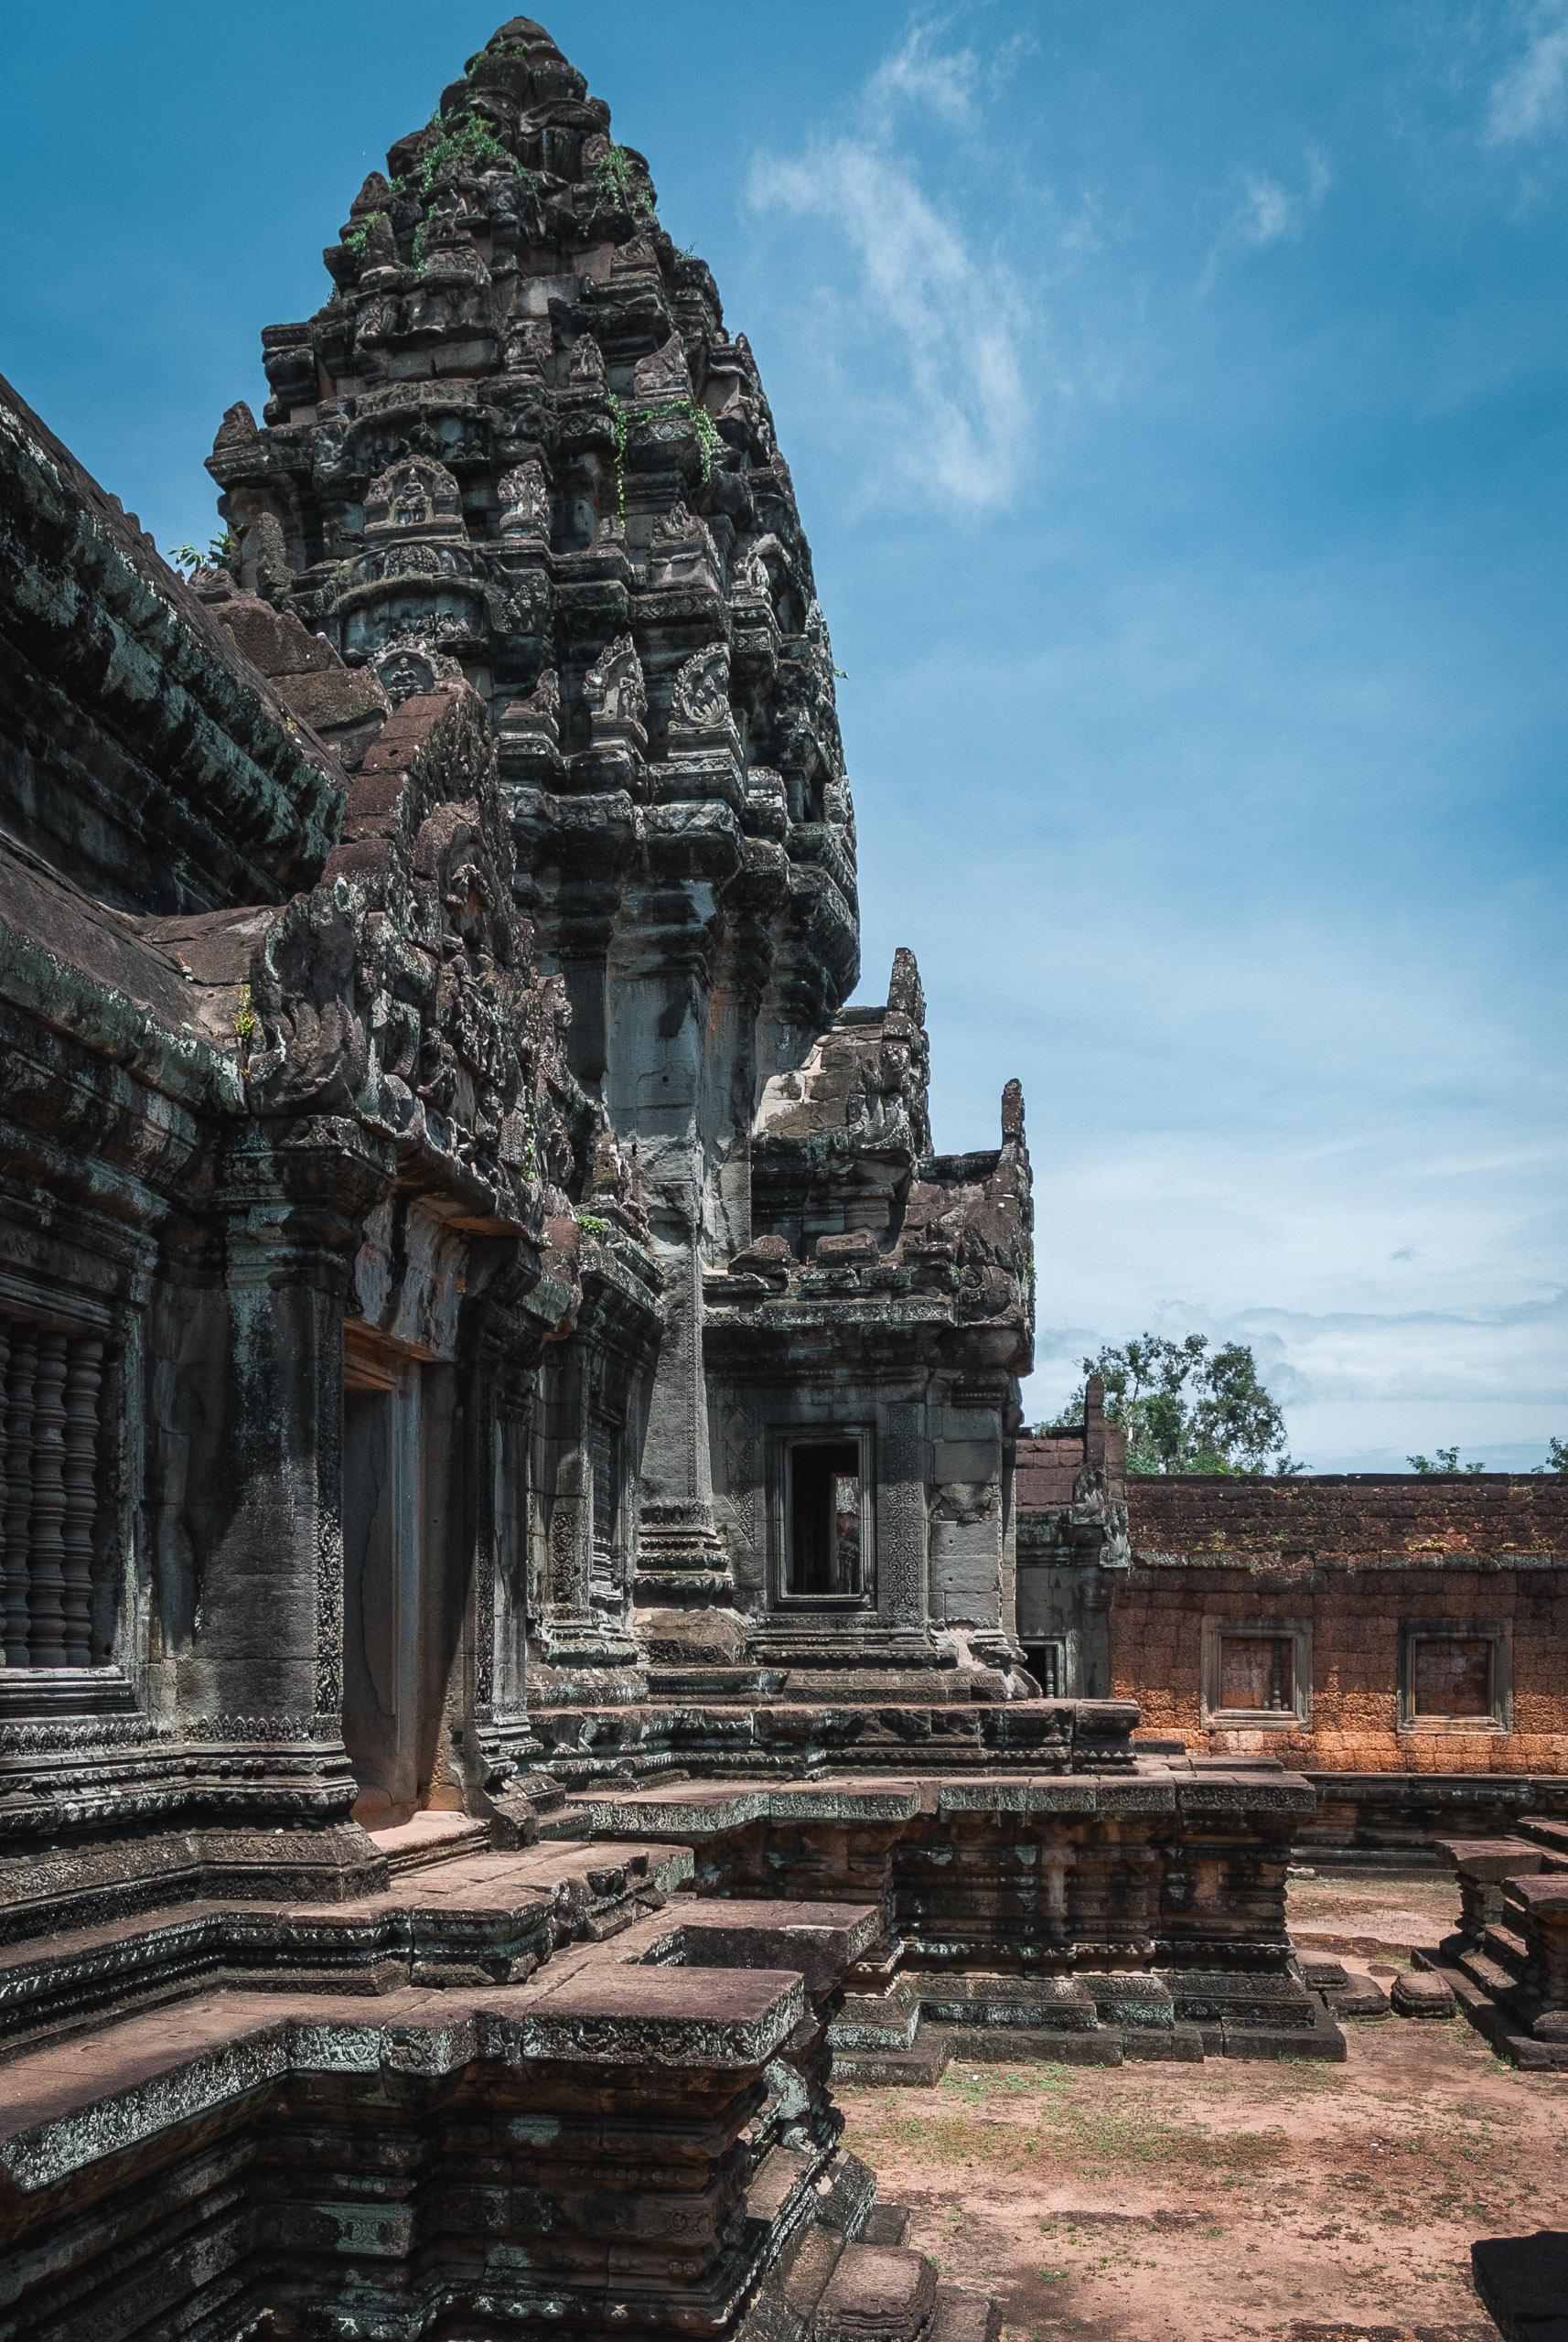 Cambodia - Angkor Wat - 2007-0627-DSC_0062_44039